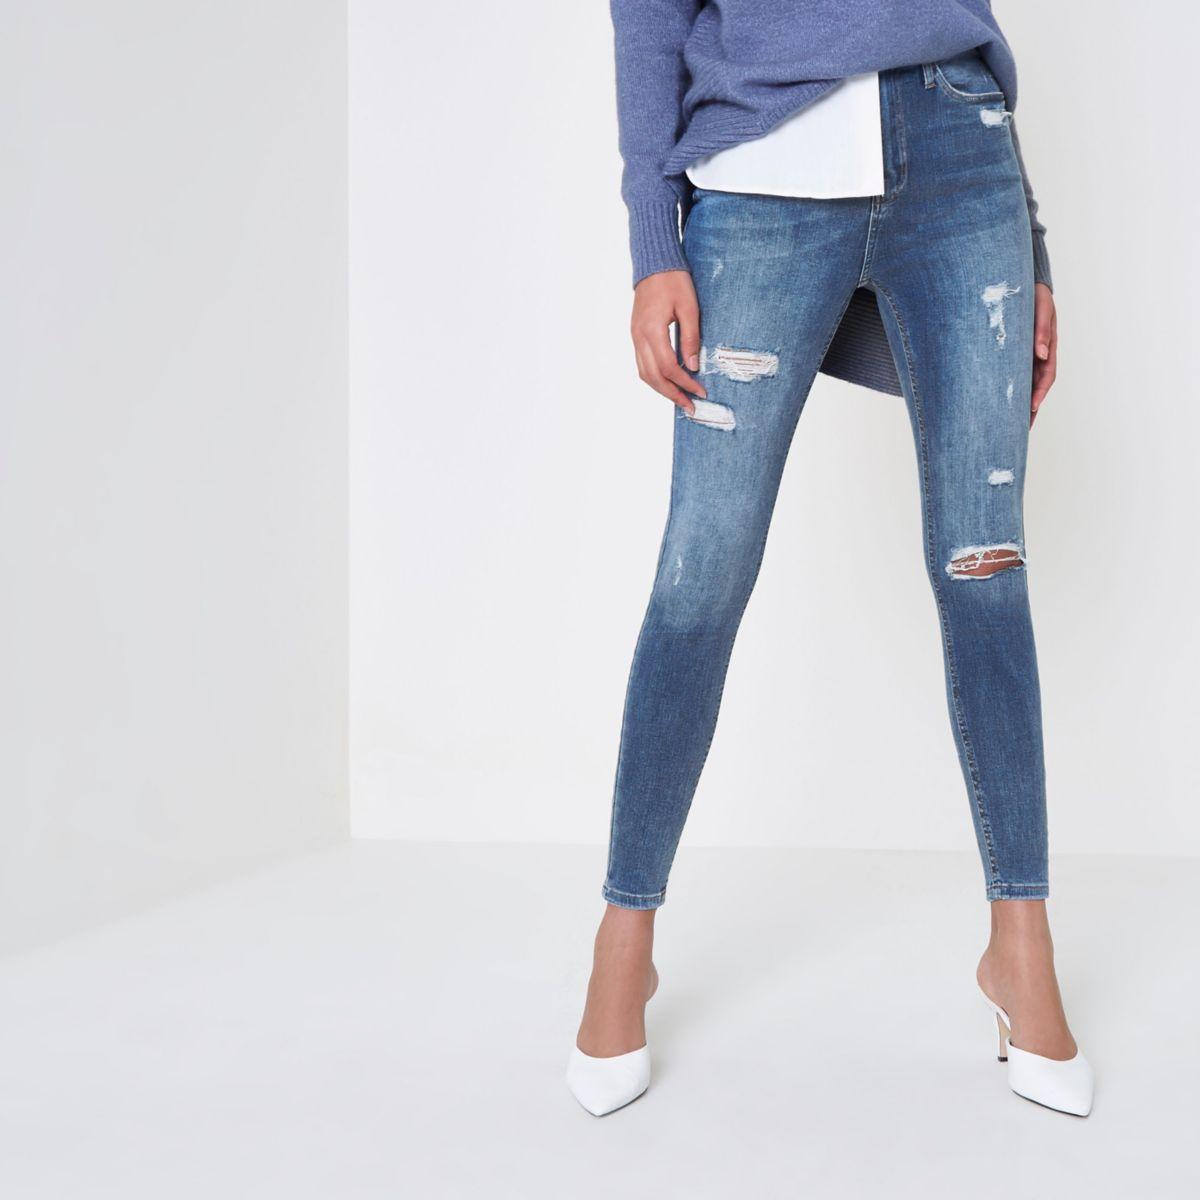 Harper - Middenblauw ripped skinny jeans met hoge taille